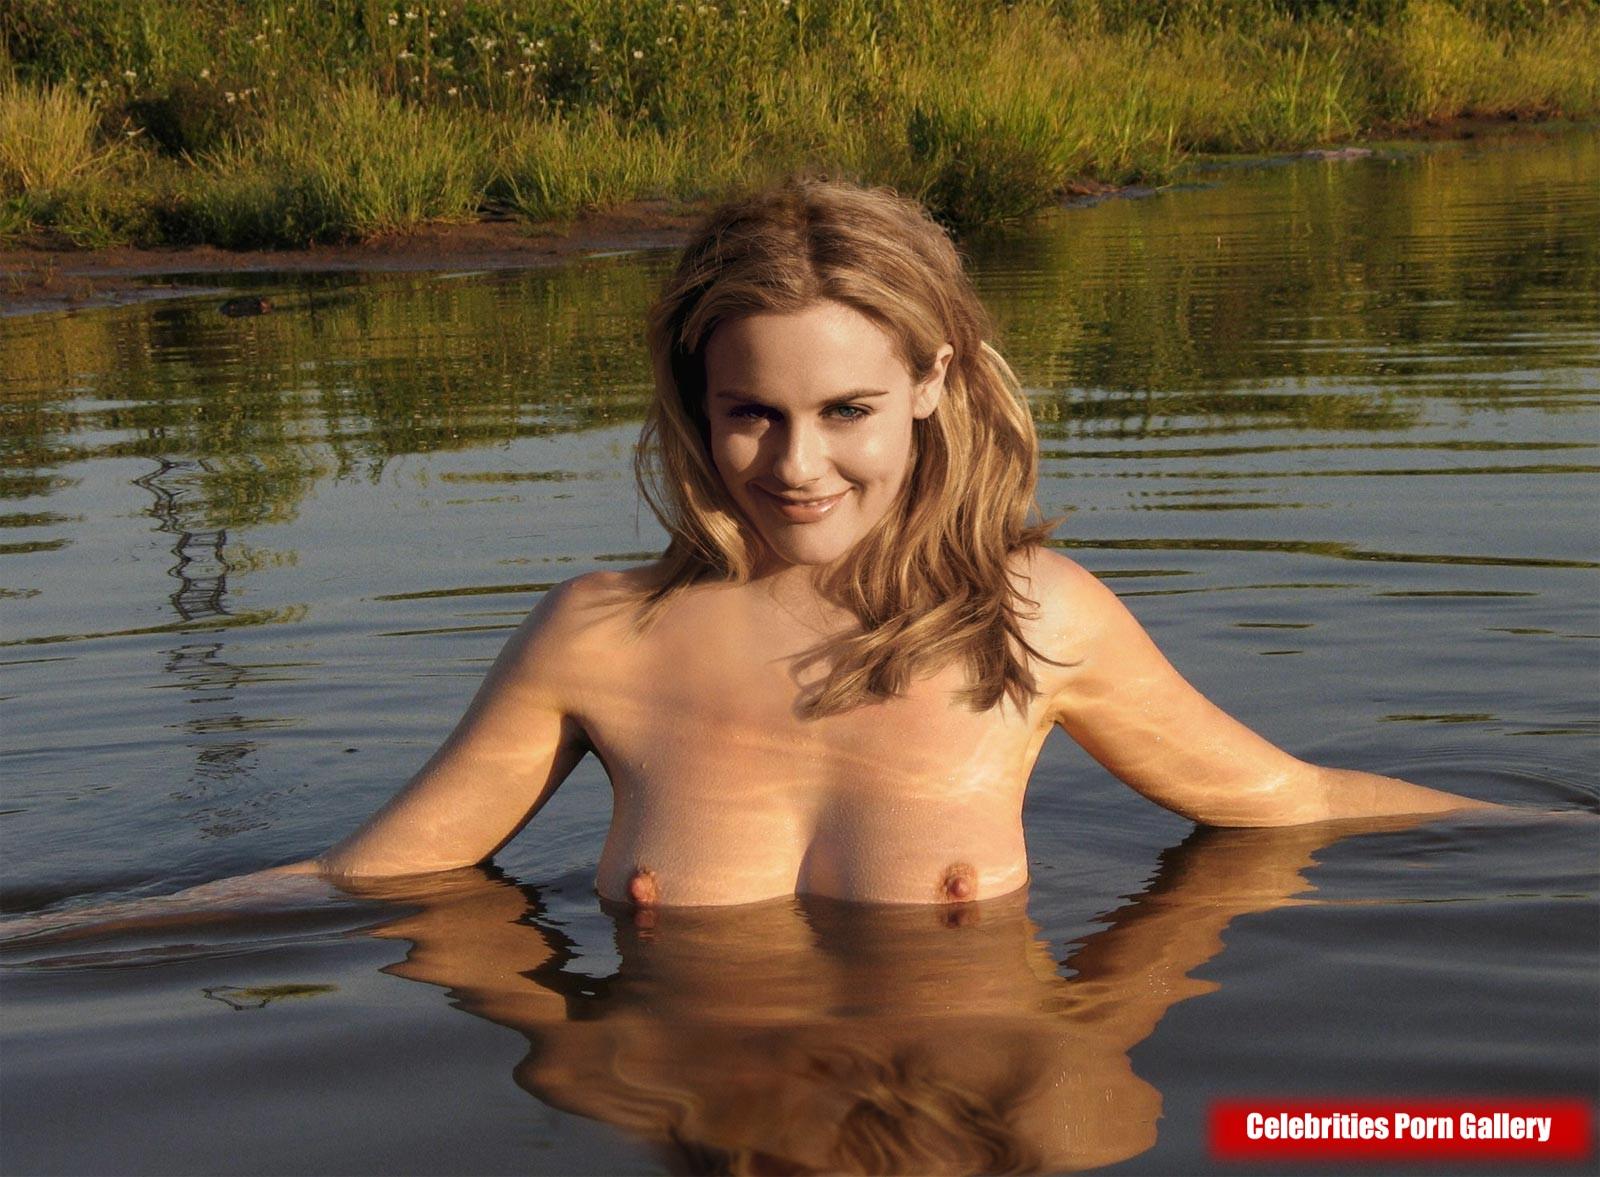 Алиса вокс голая фото интересно. Хотелось